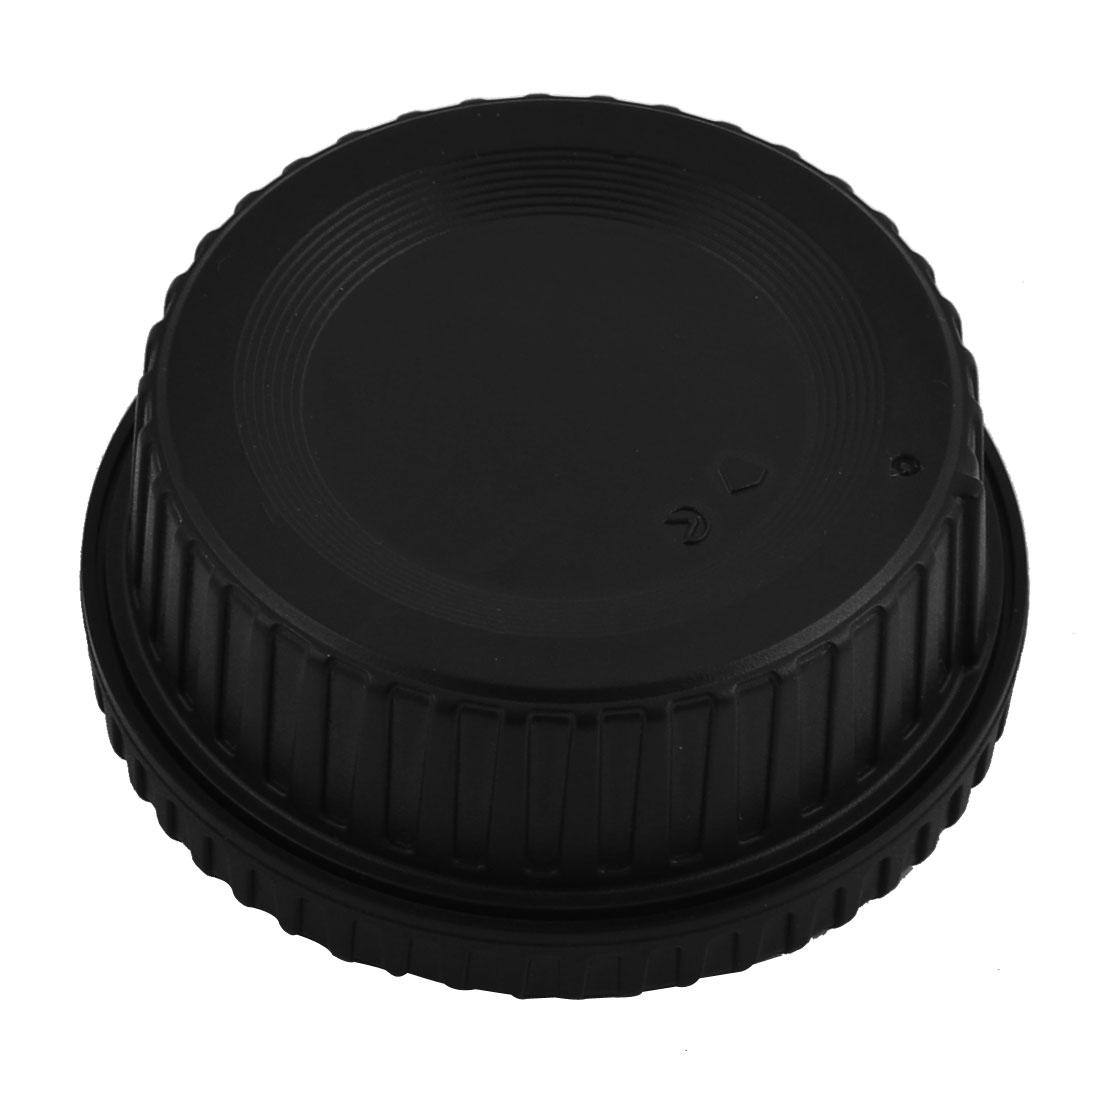 Digital SLR DSLR Plastic Camera Body Cover Rear Lens Cap Black 58 x 25mm